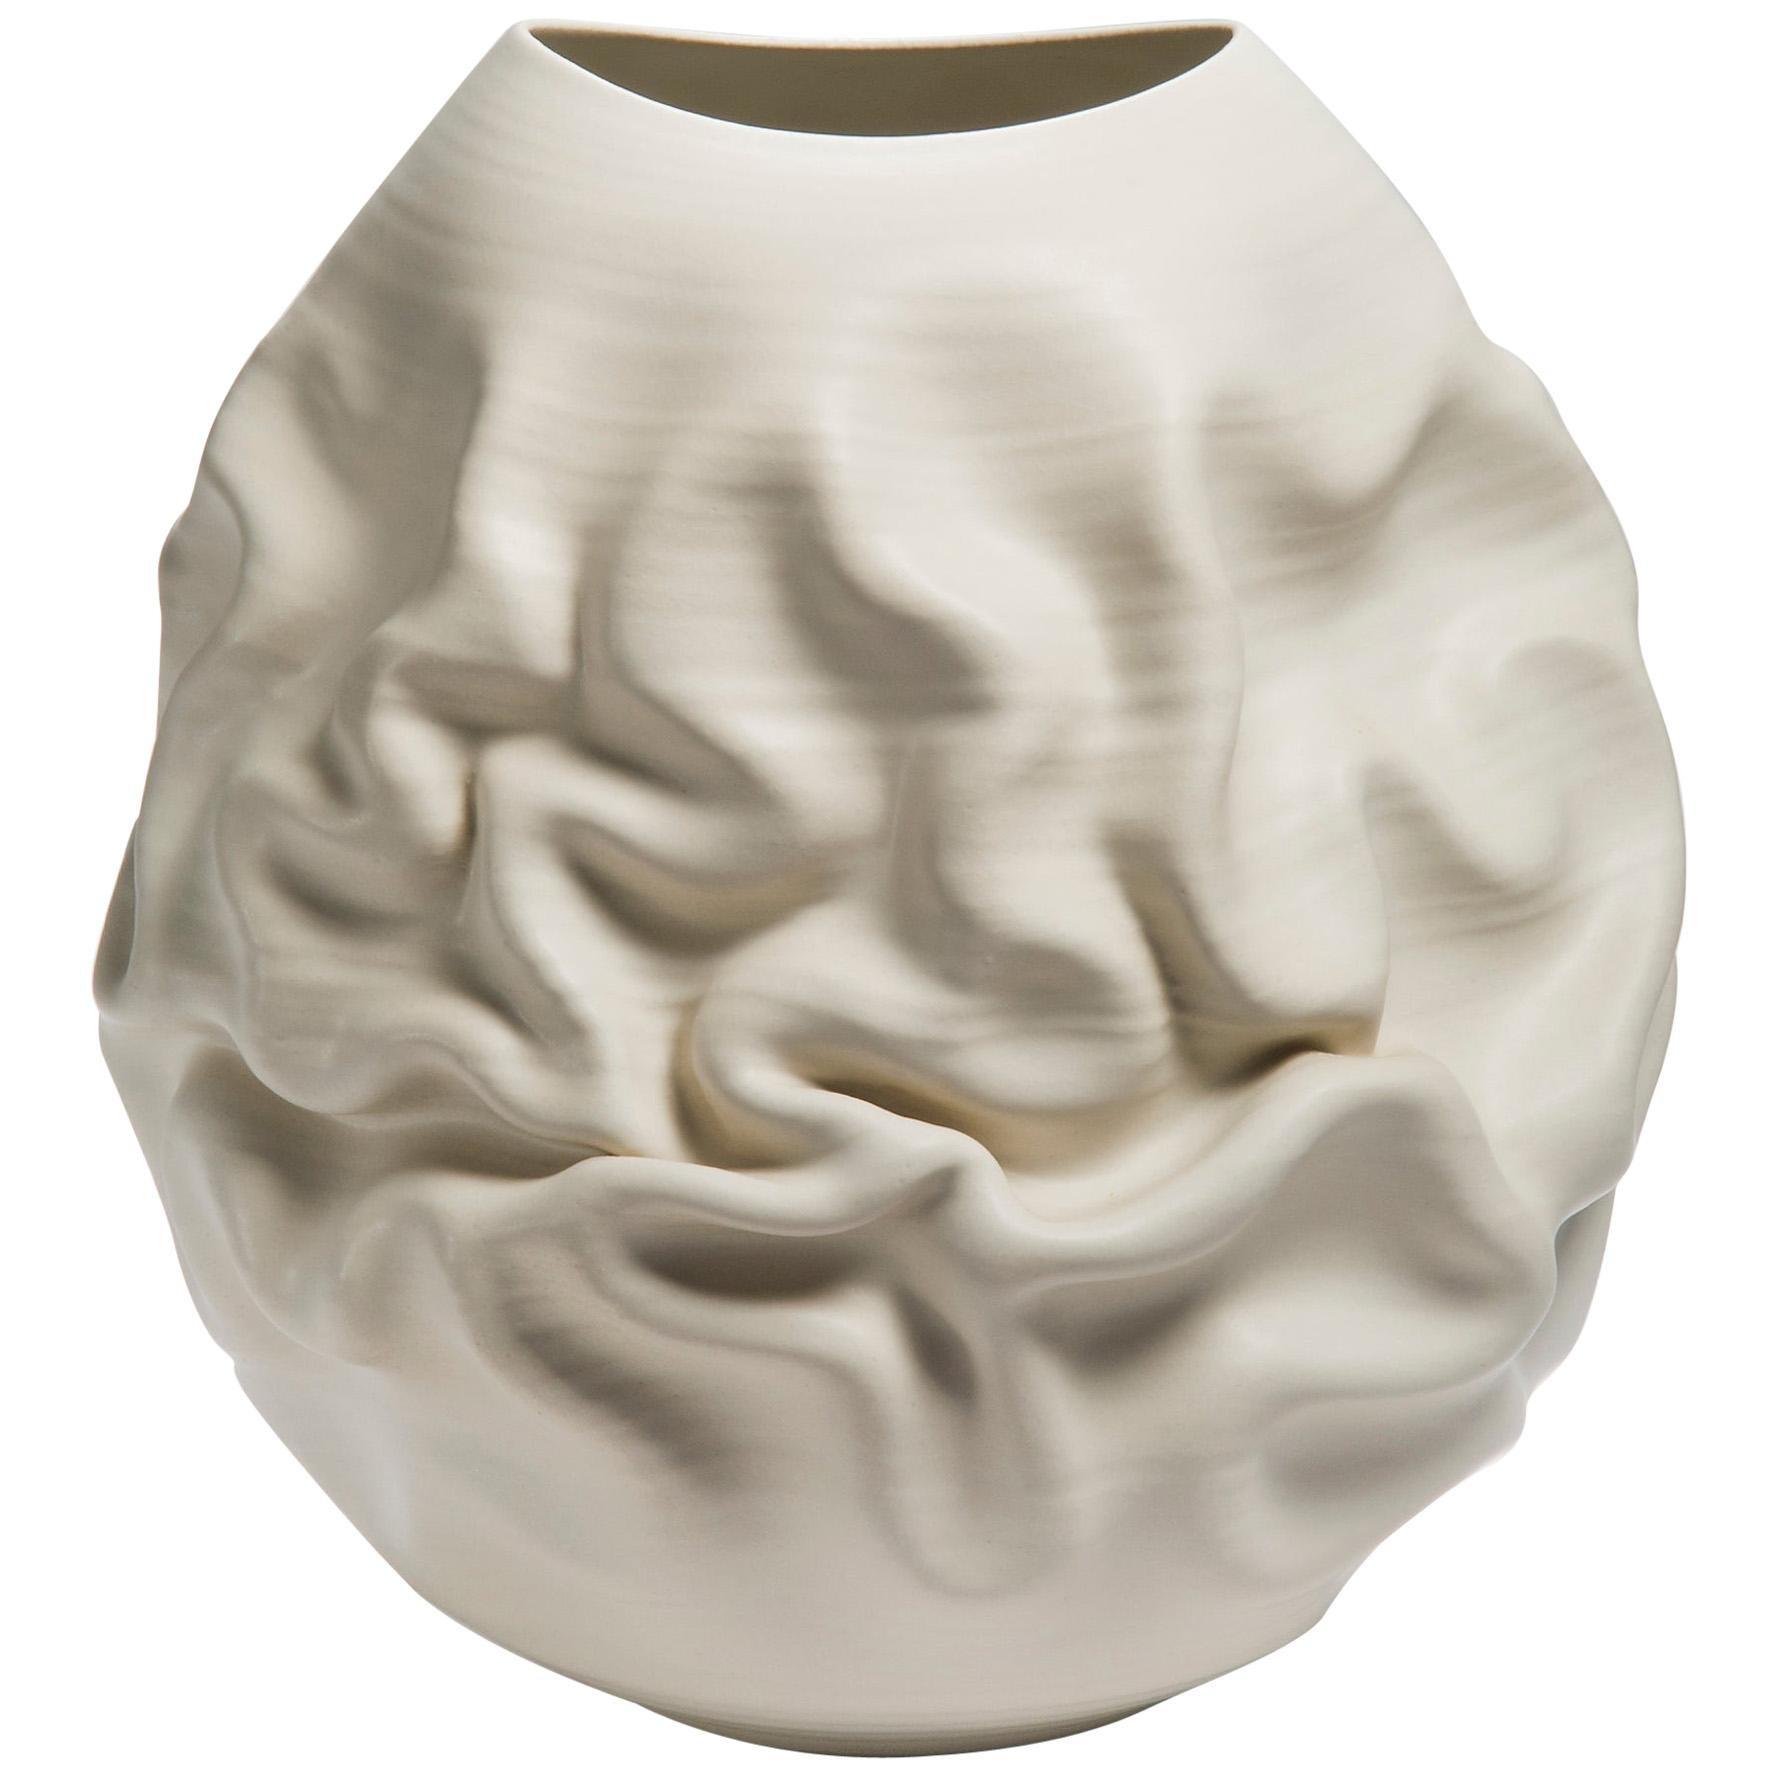 Large White Dehydrated Form No 33, Ceramic Vessel by Nicholas Arroyave-Portela